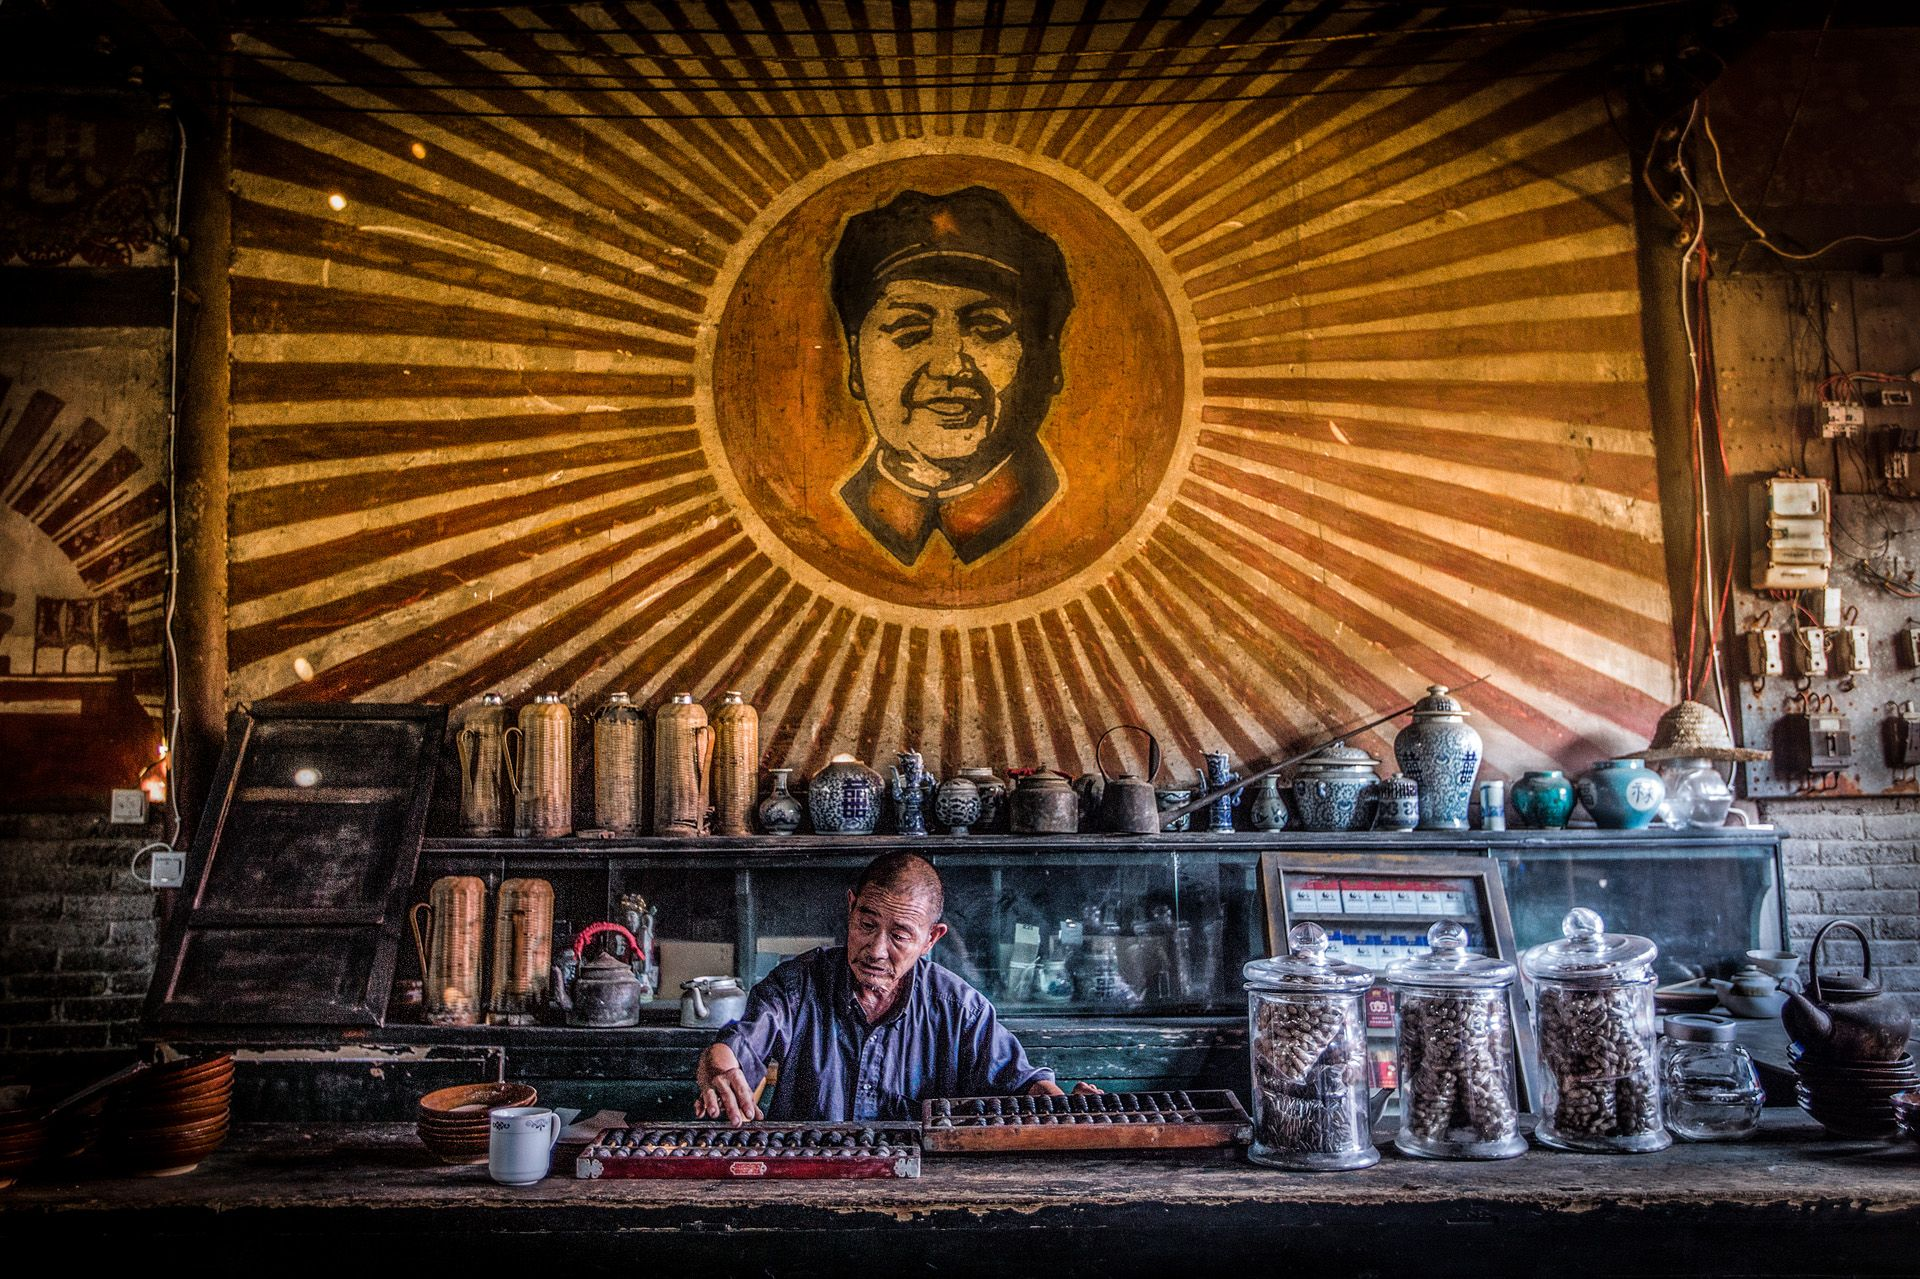 Победители фотоконкурса Siena International Photo Awards 2017